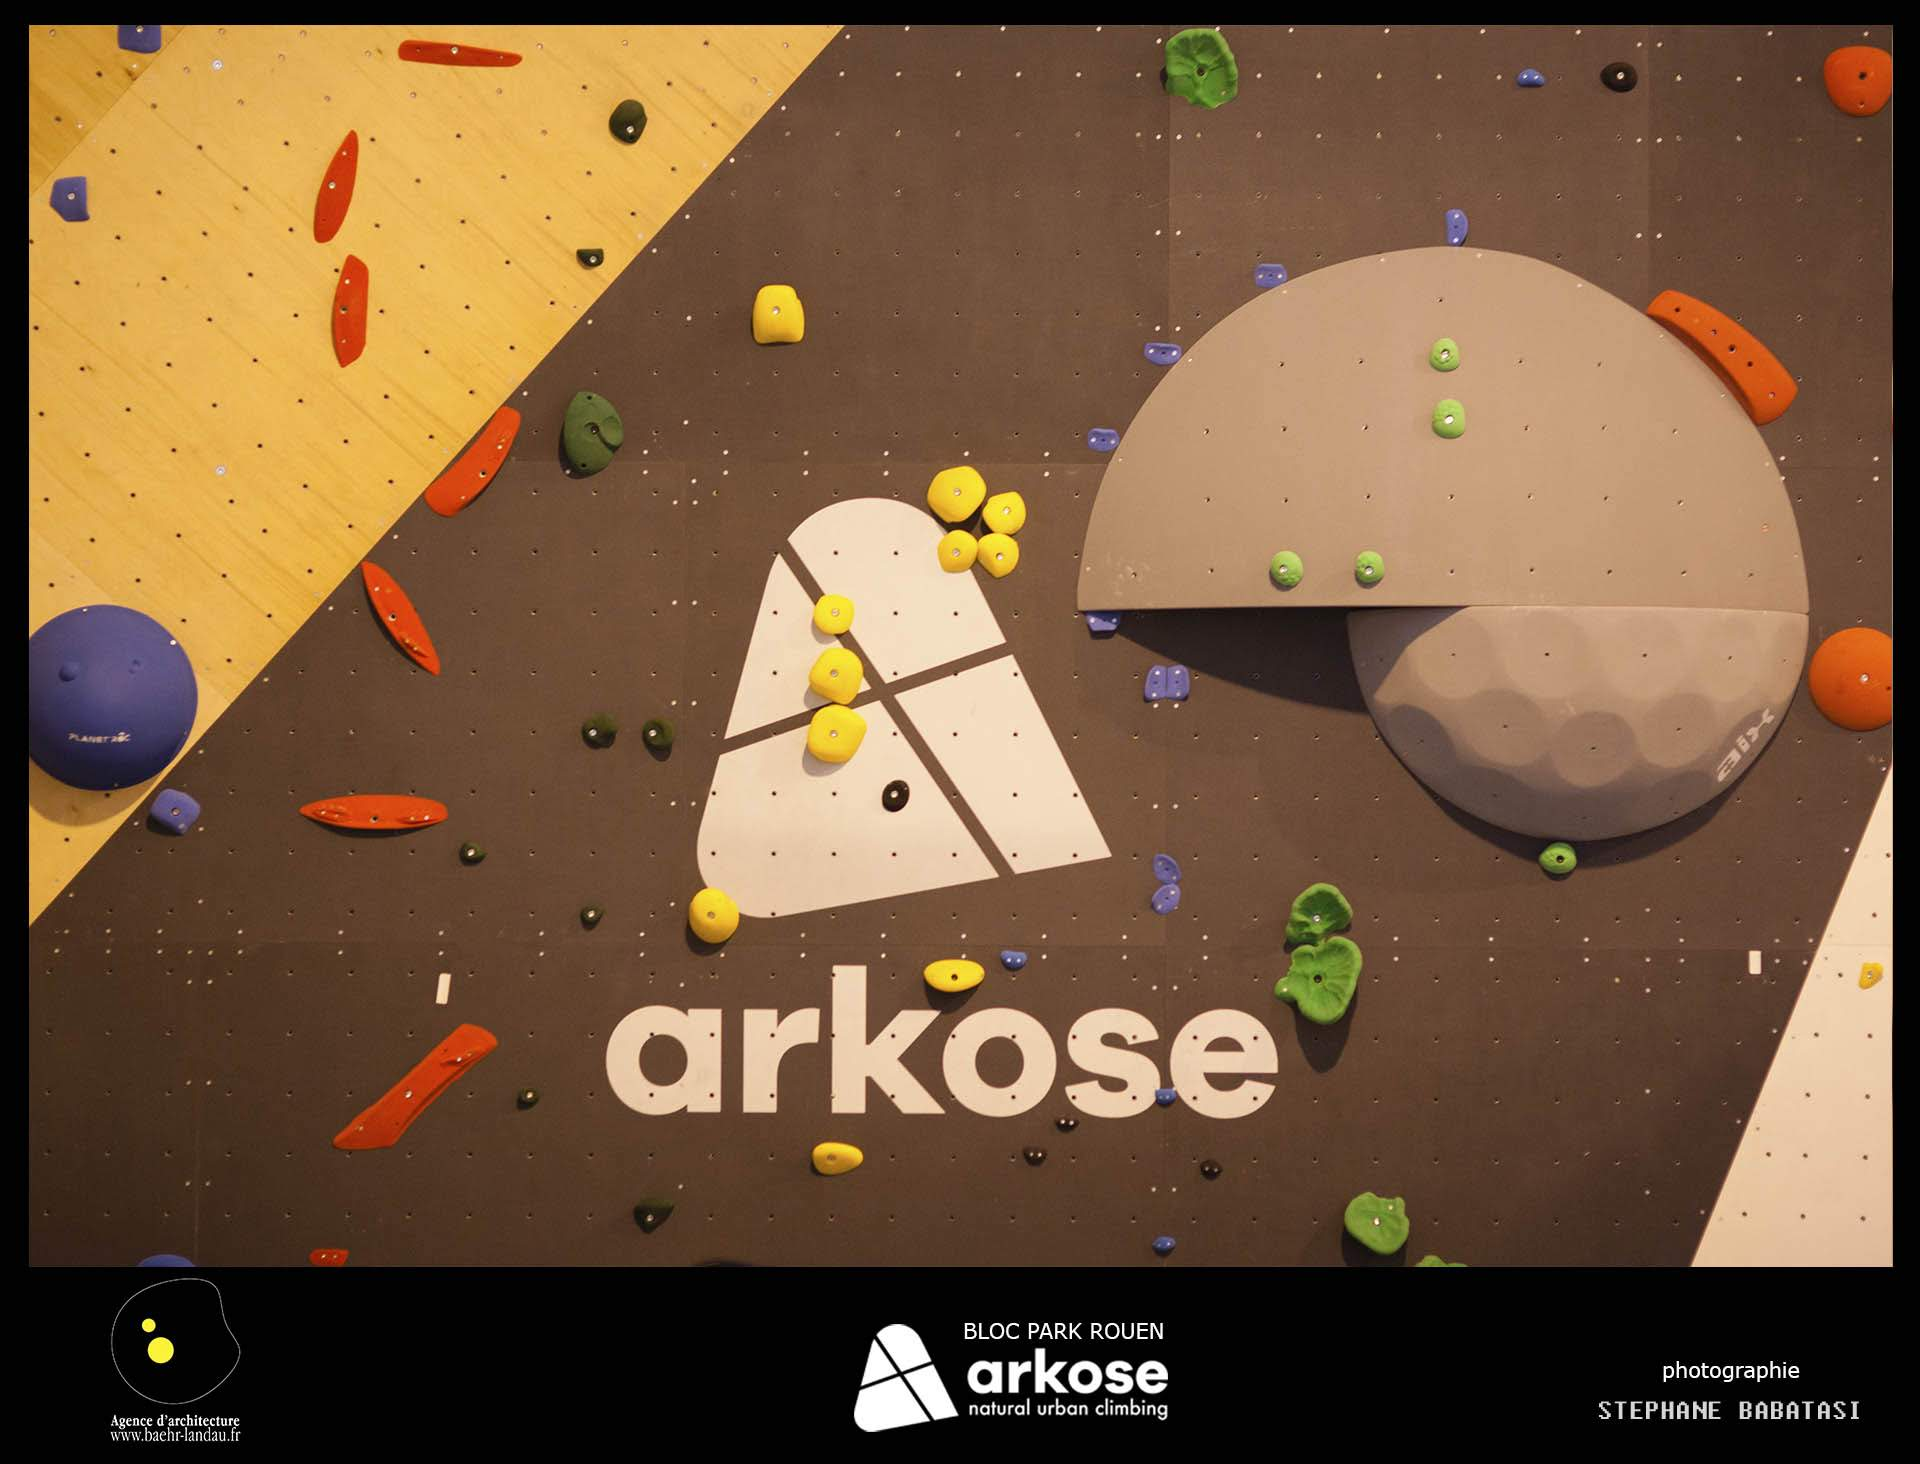 ARKOSE_ROUEN_photoSB-33